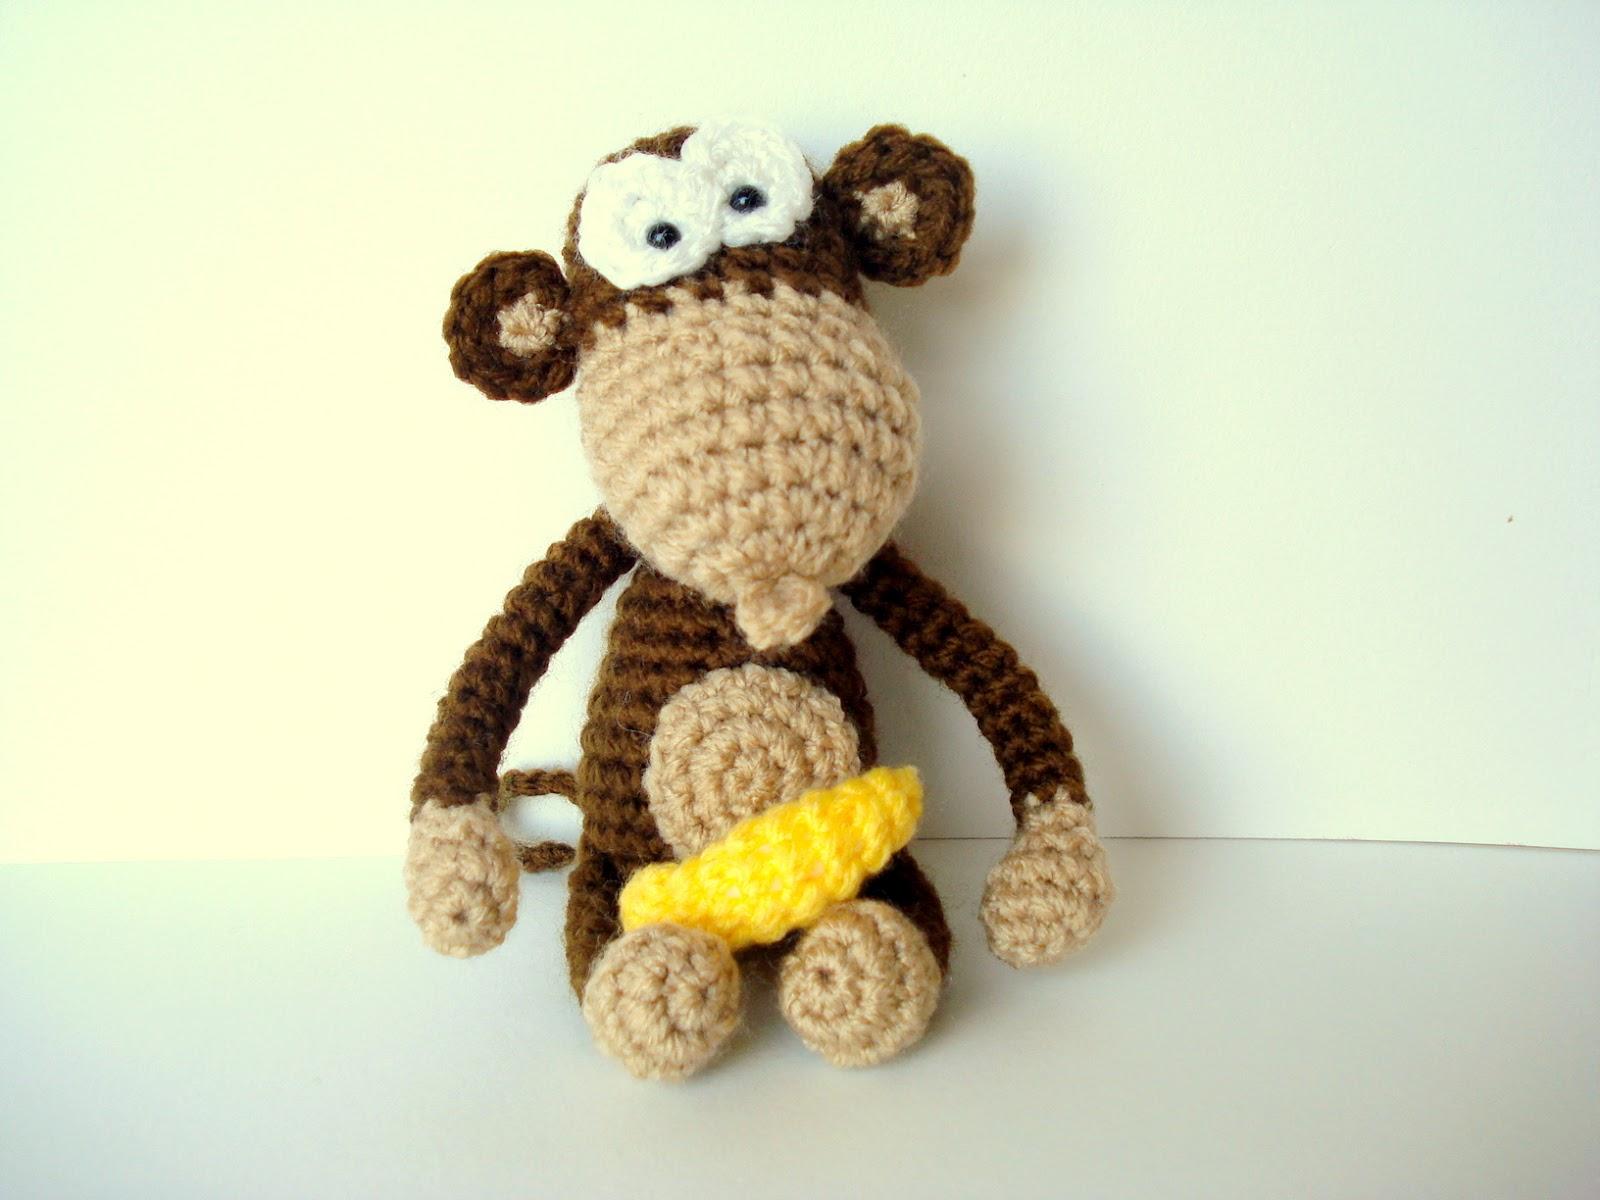 Amigurumi Orangutan Pattern : AllSoCute Amigurumis: Amigurumi Monkey Pattern, Crocheted ...